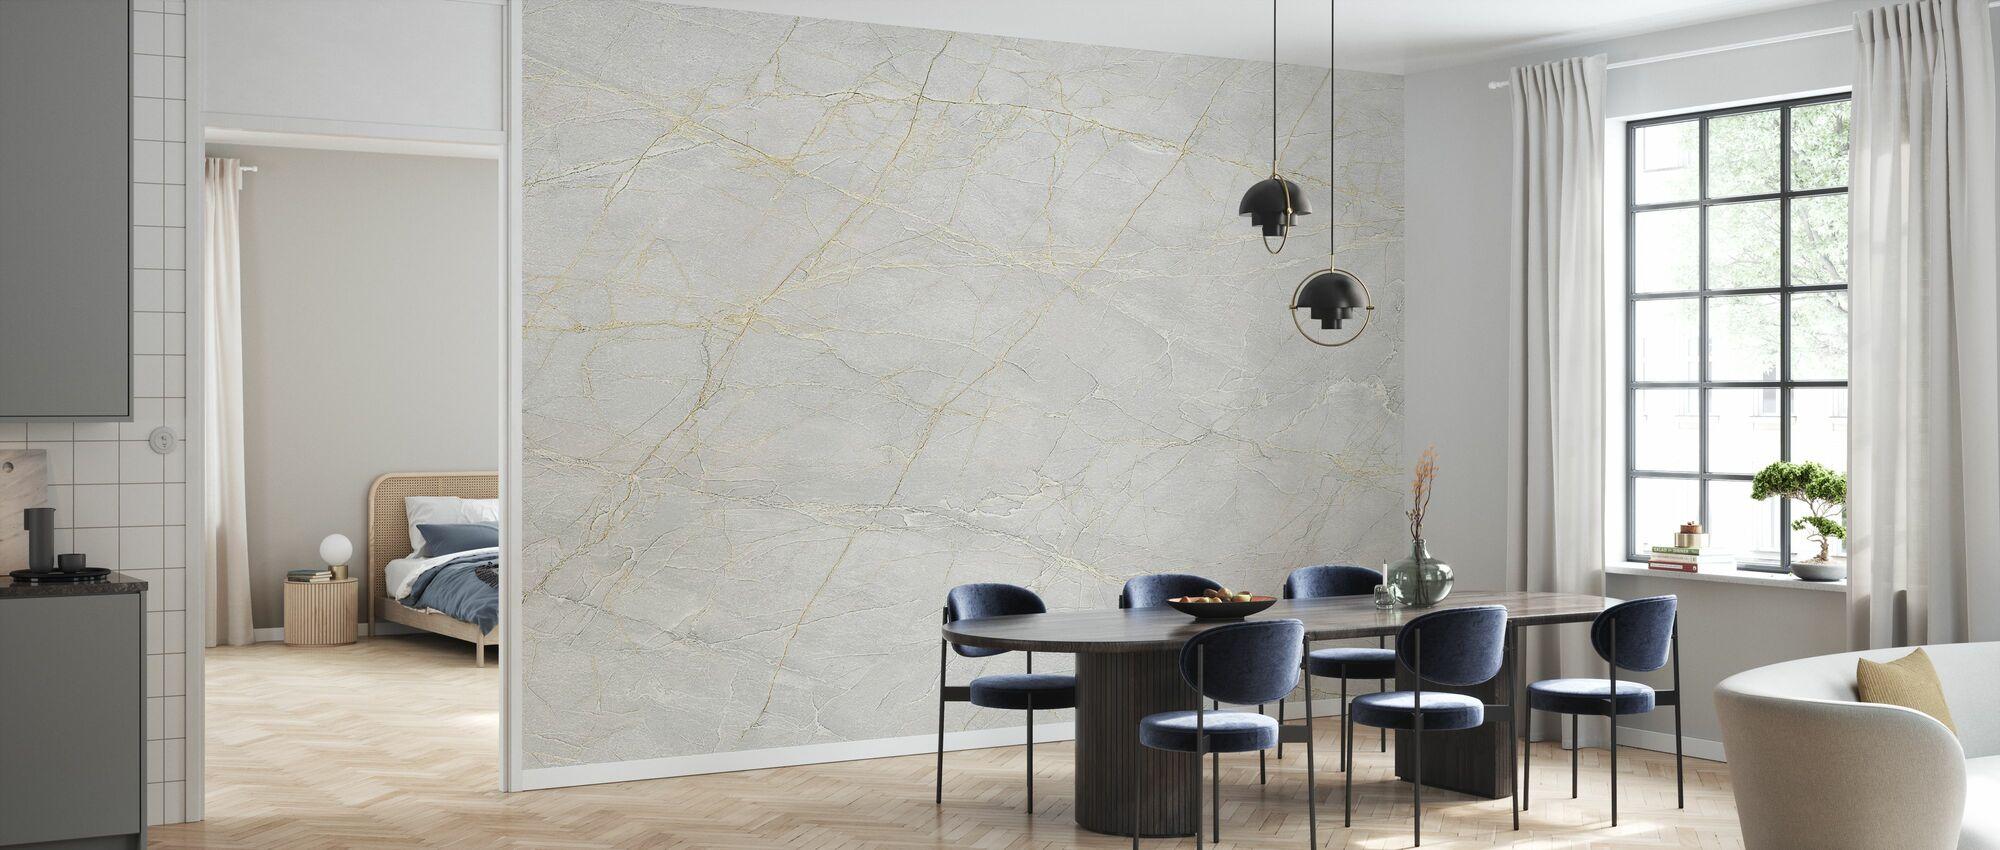 Buff Marble - Wallpaper - Kitchen